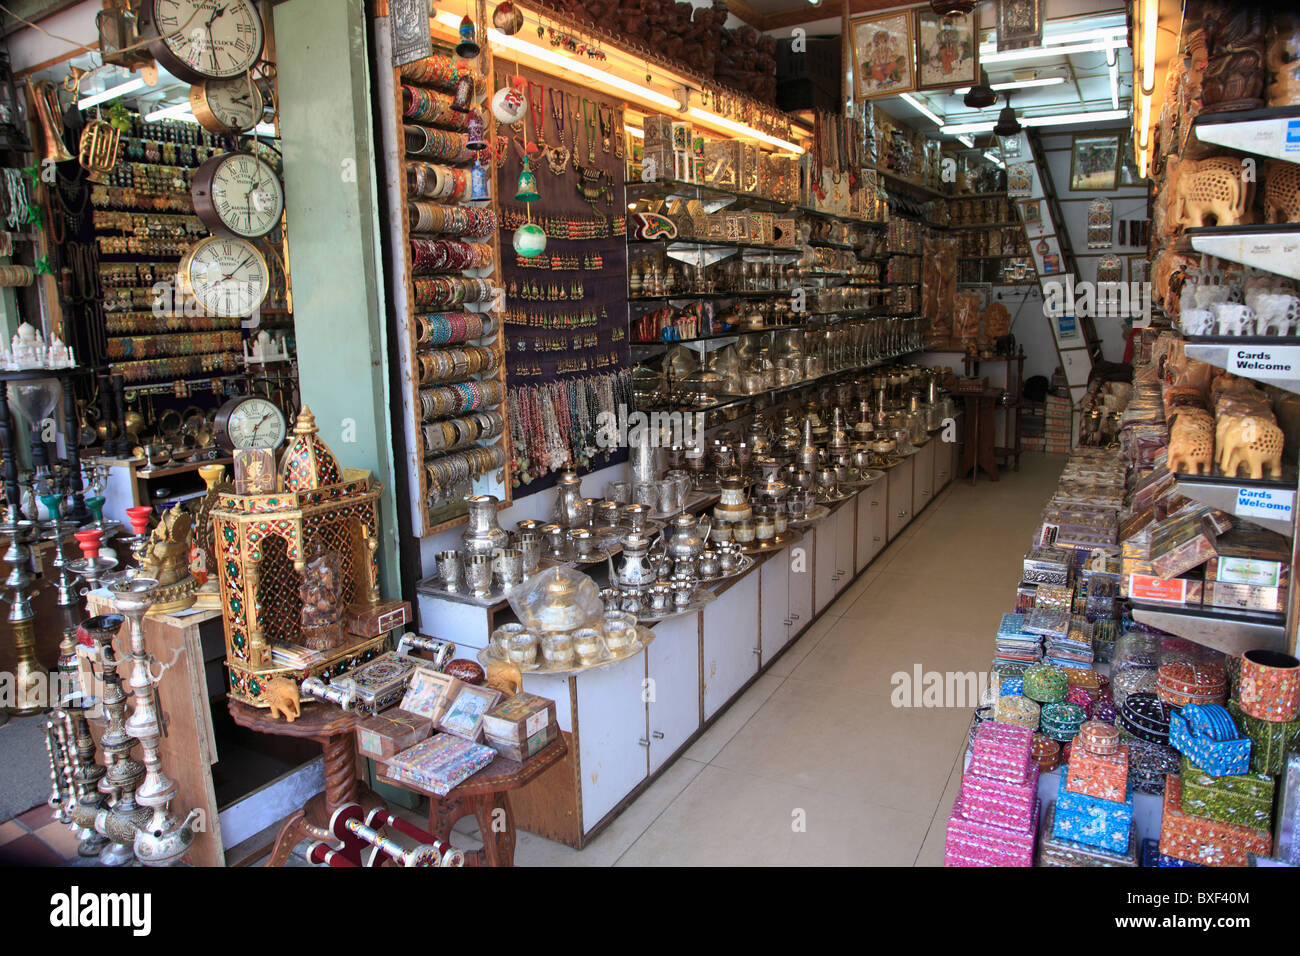 Craft Crafts Handicraft Handicrafts Souvenir Souvenirs Stall Stalls